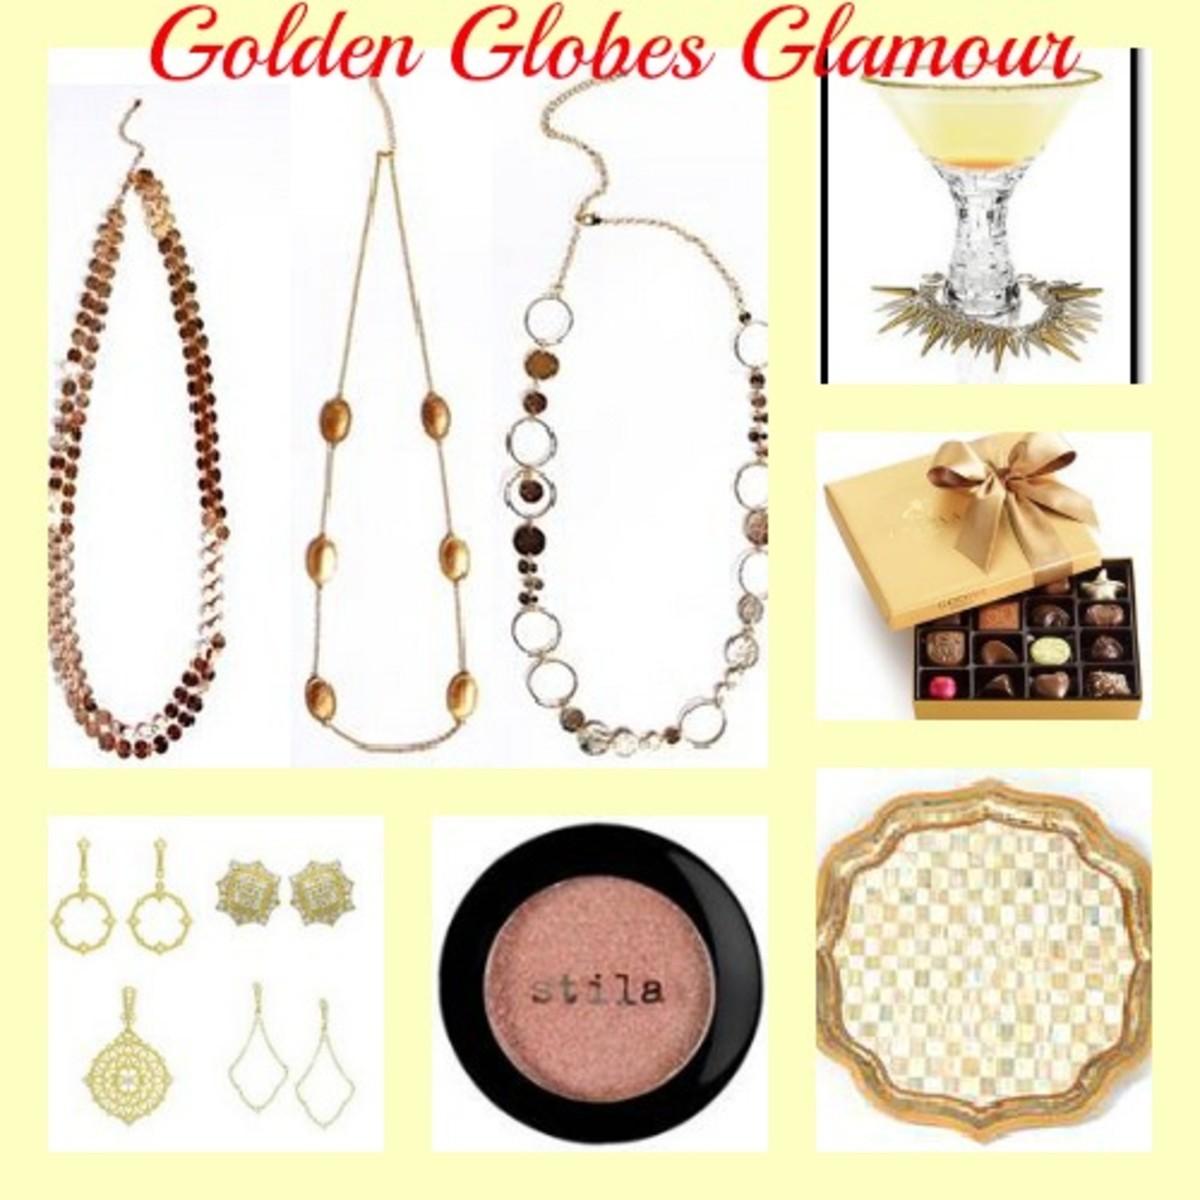 Golden Globes, Golden Globes Glamour